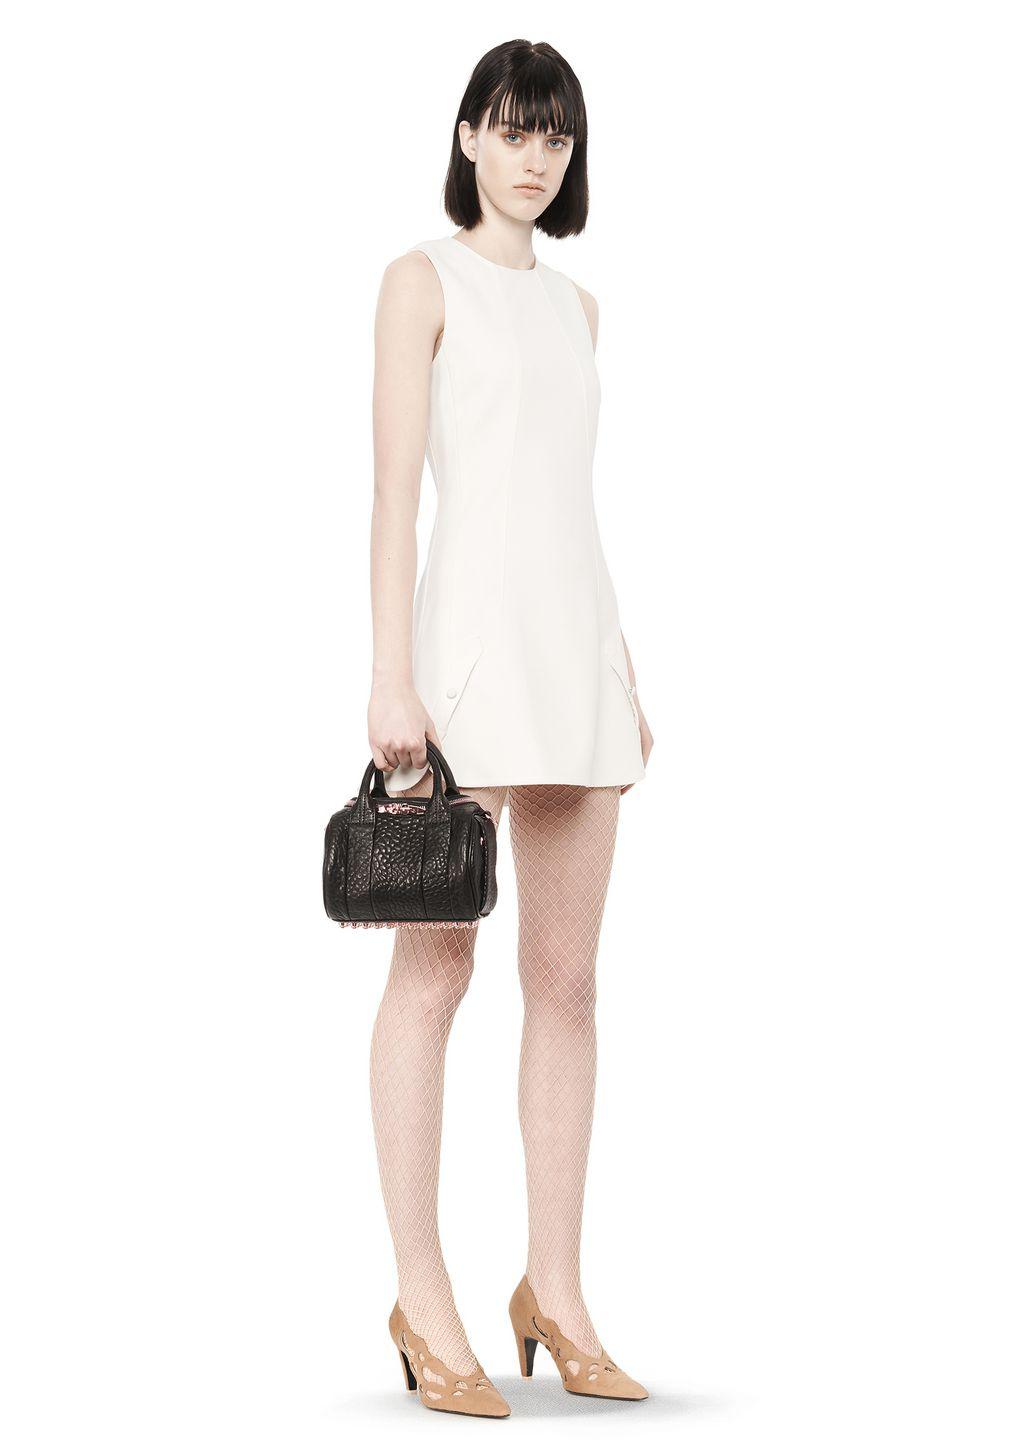 Alexander Wang - Designer Clothes & Accessories